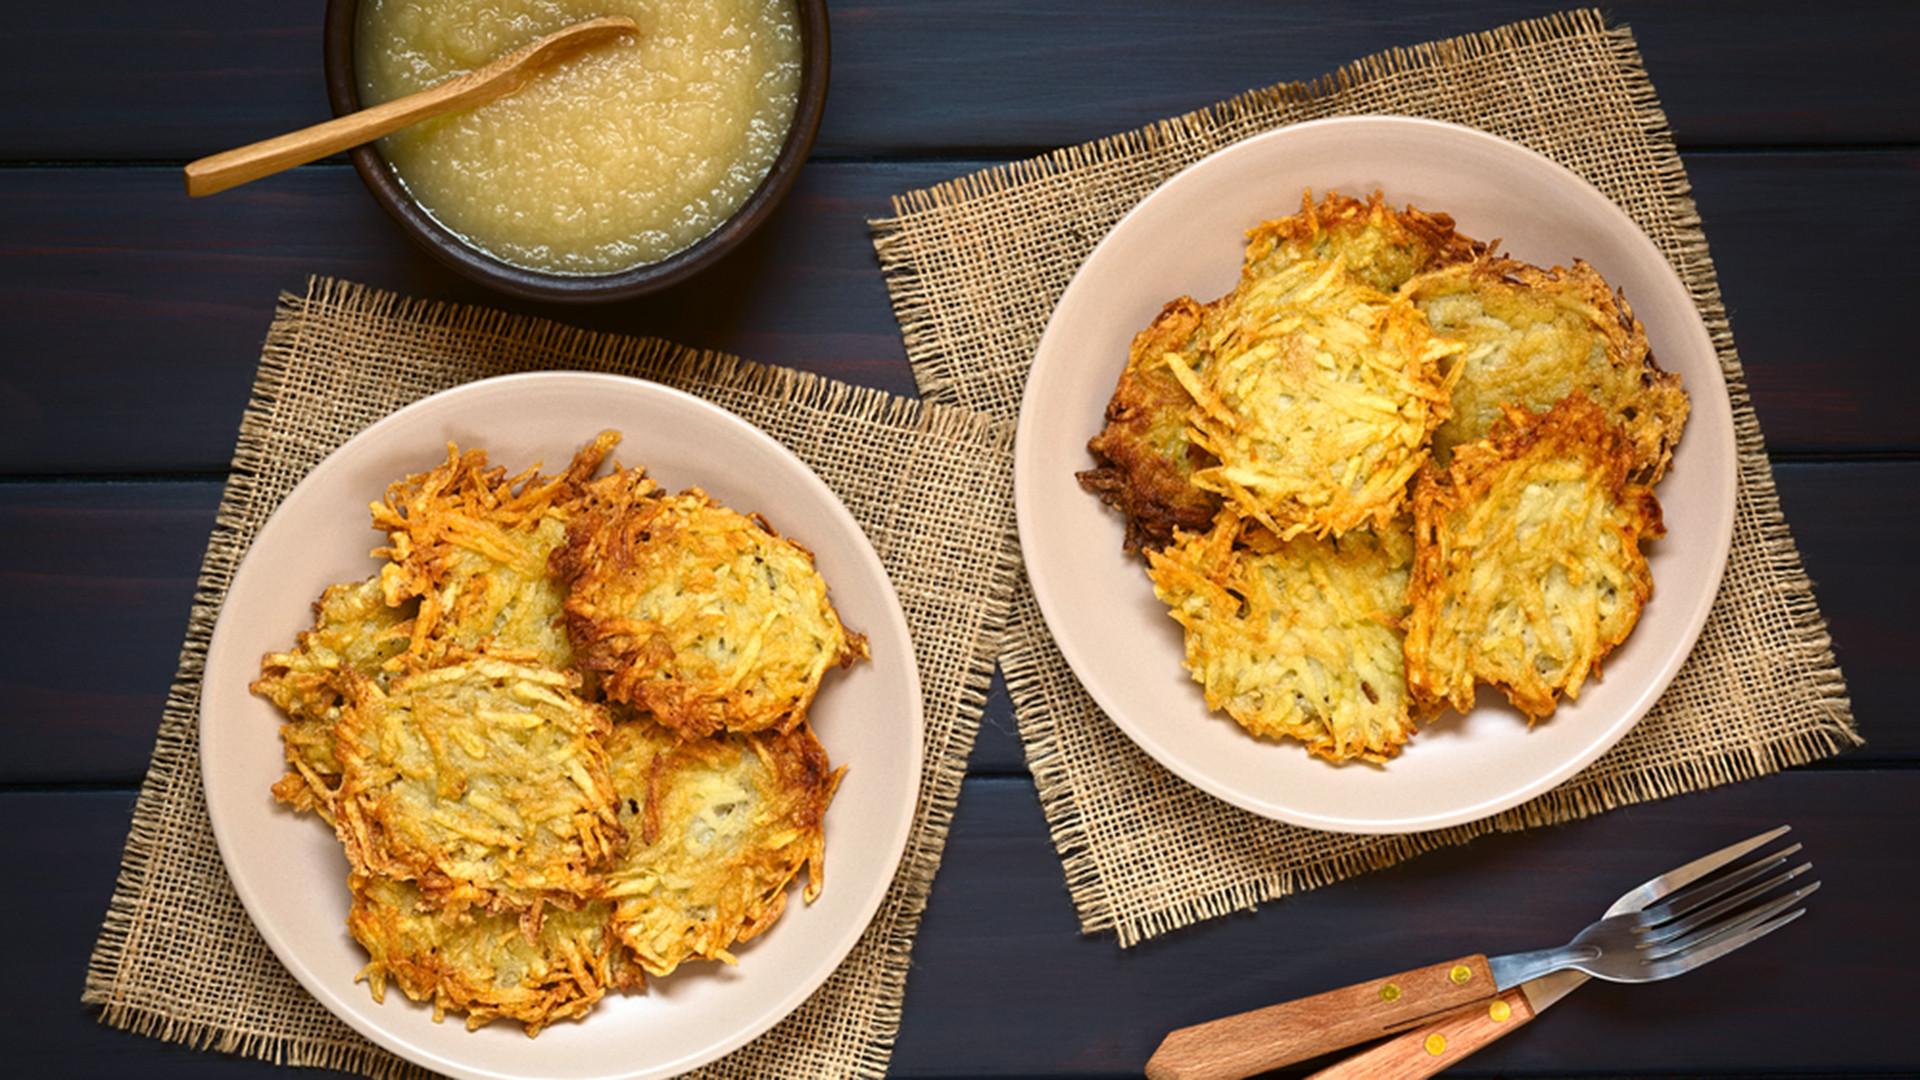 Hanukkah Potato Latkes  Crispy Hanukkah Potato Pancakes Latkes TODAY